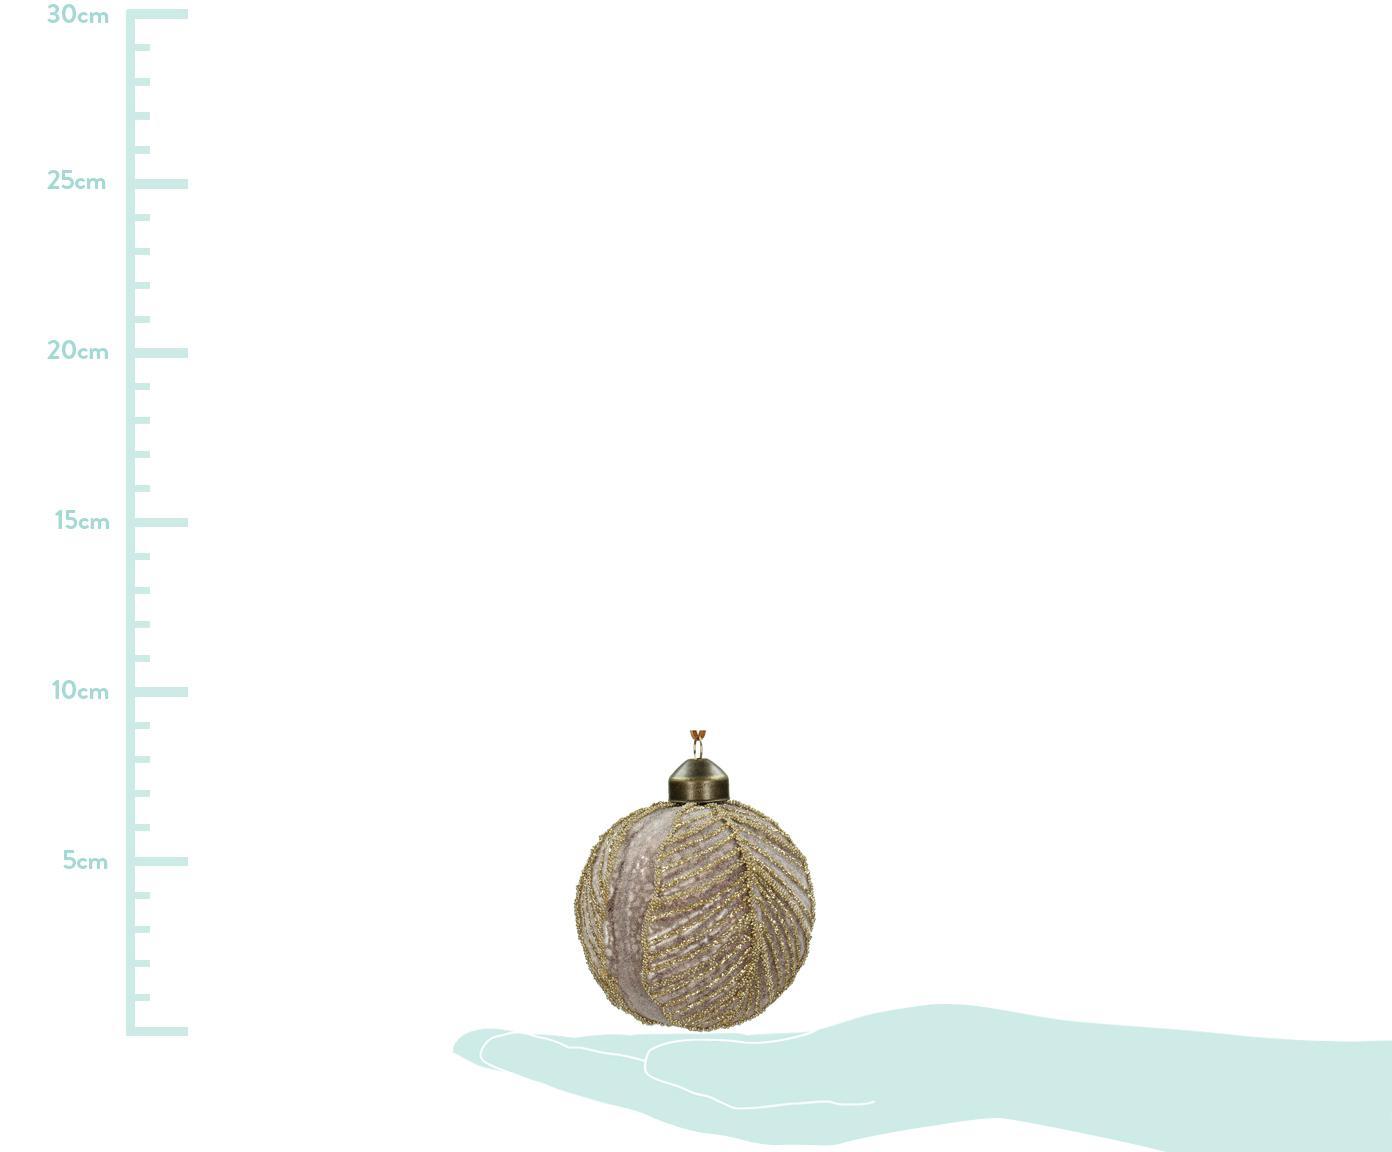 Weihnachtskugeln Leaf Ø8cm, 2Stück, Glas, Polyester, Rosa, Ø 8 cm